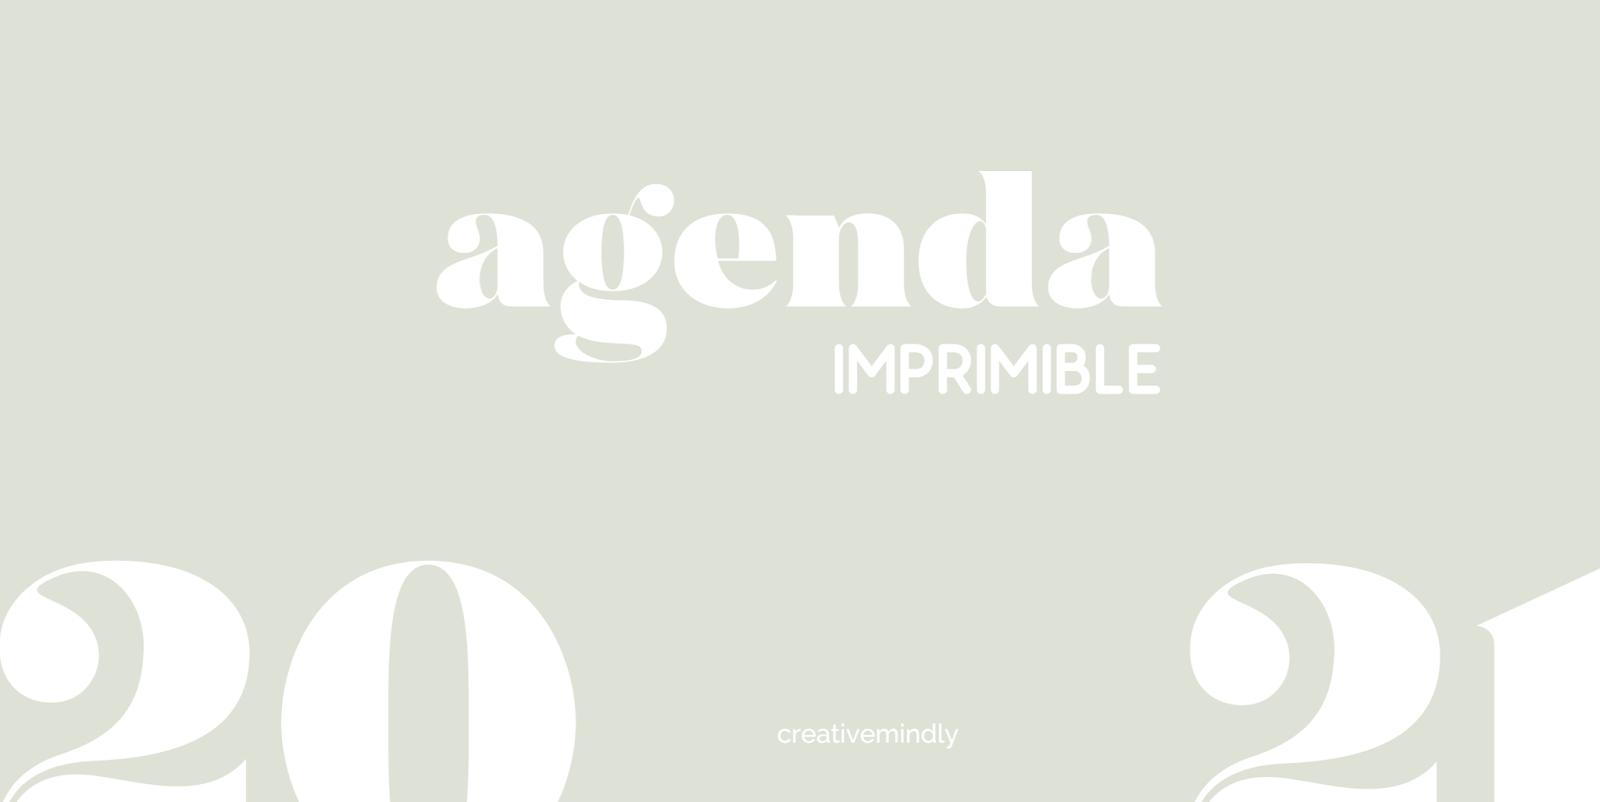 Creative Mindly Agenda Imprimible 2020 2021